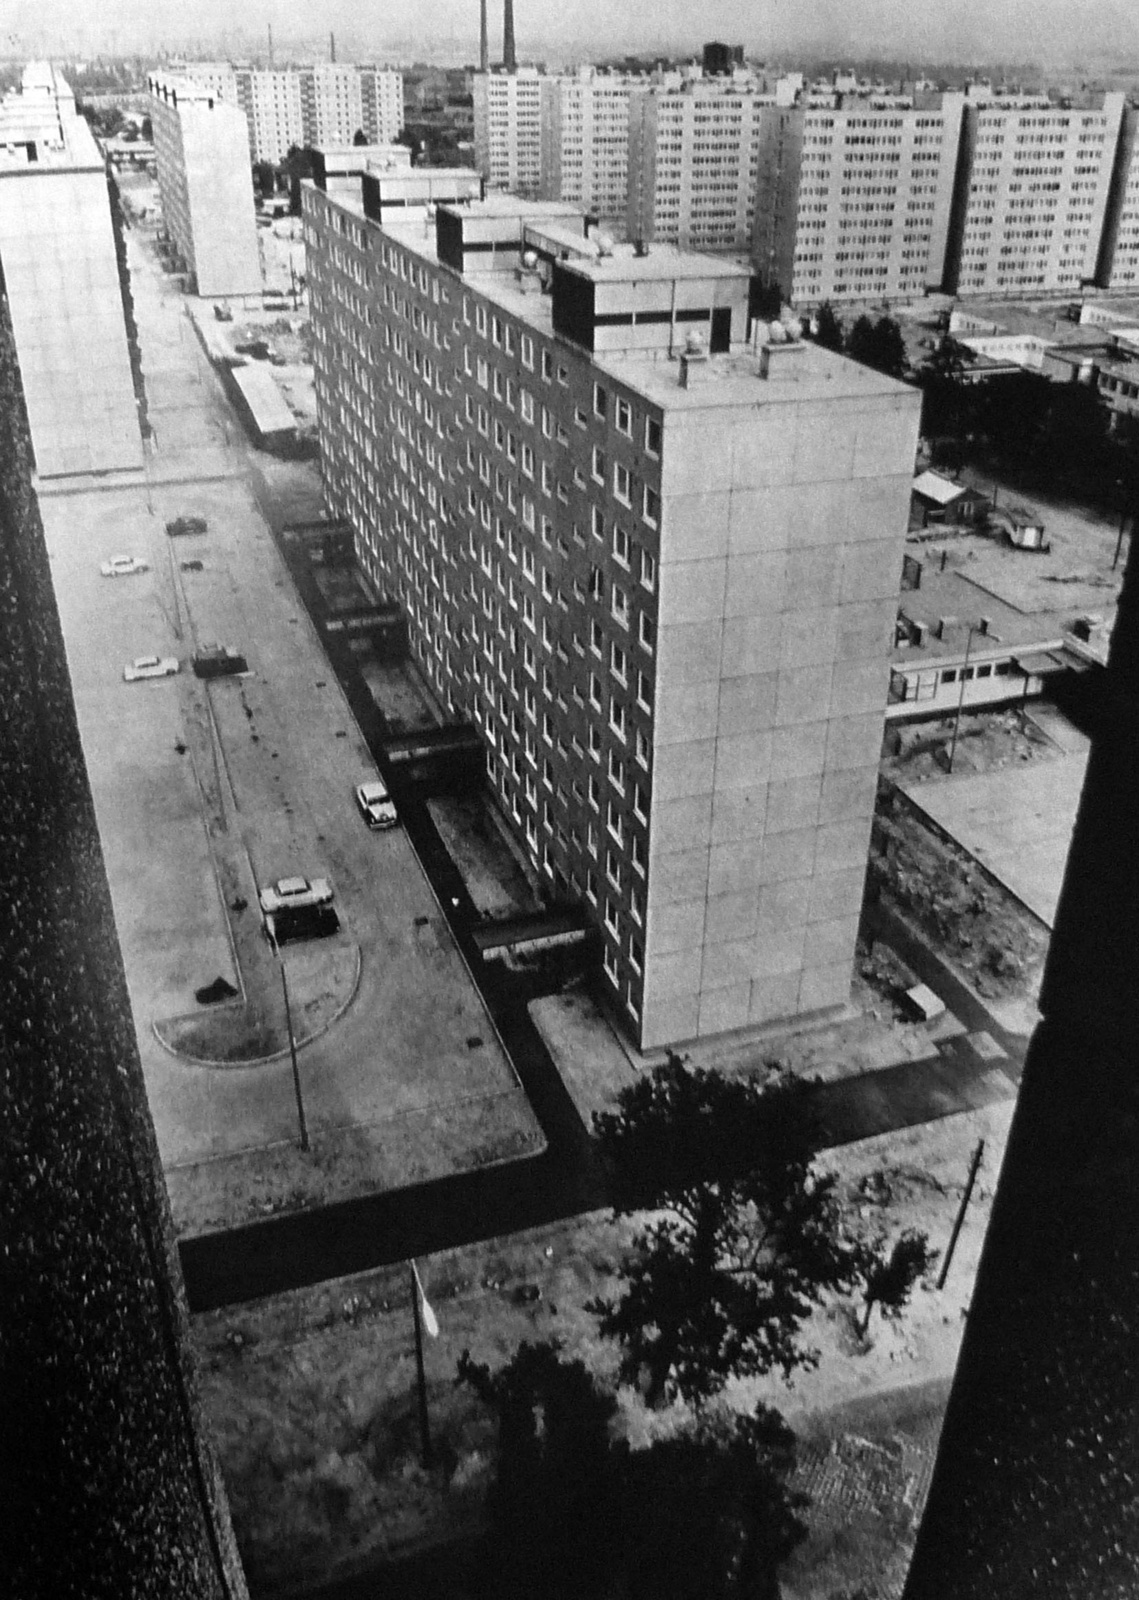 CsepeliLtp-Budapest-1975-8